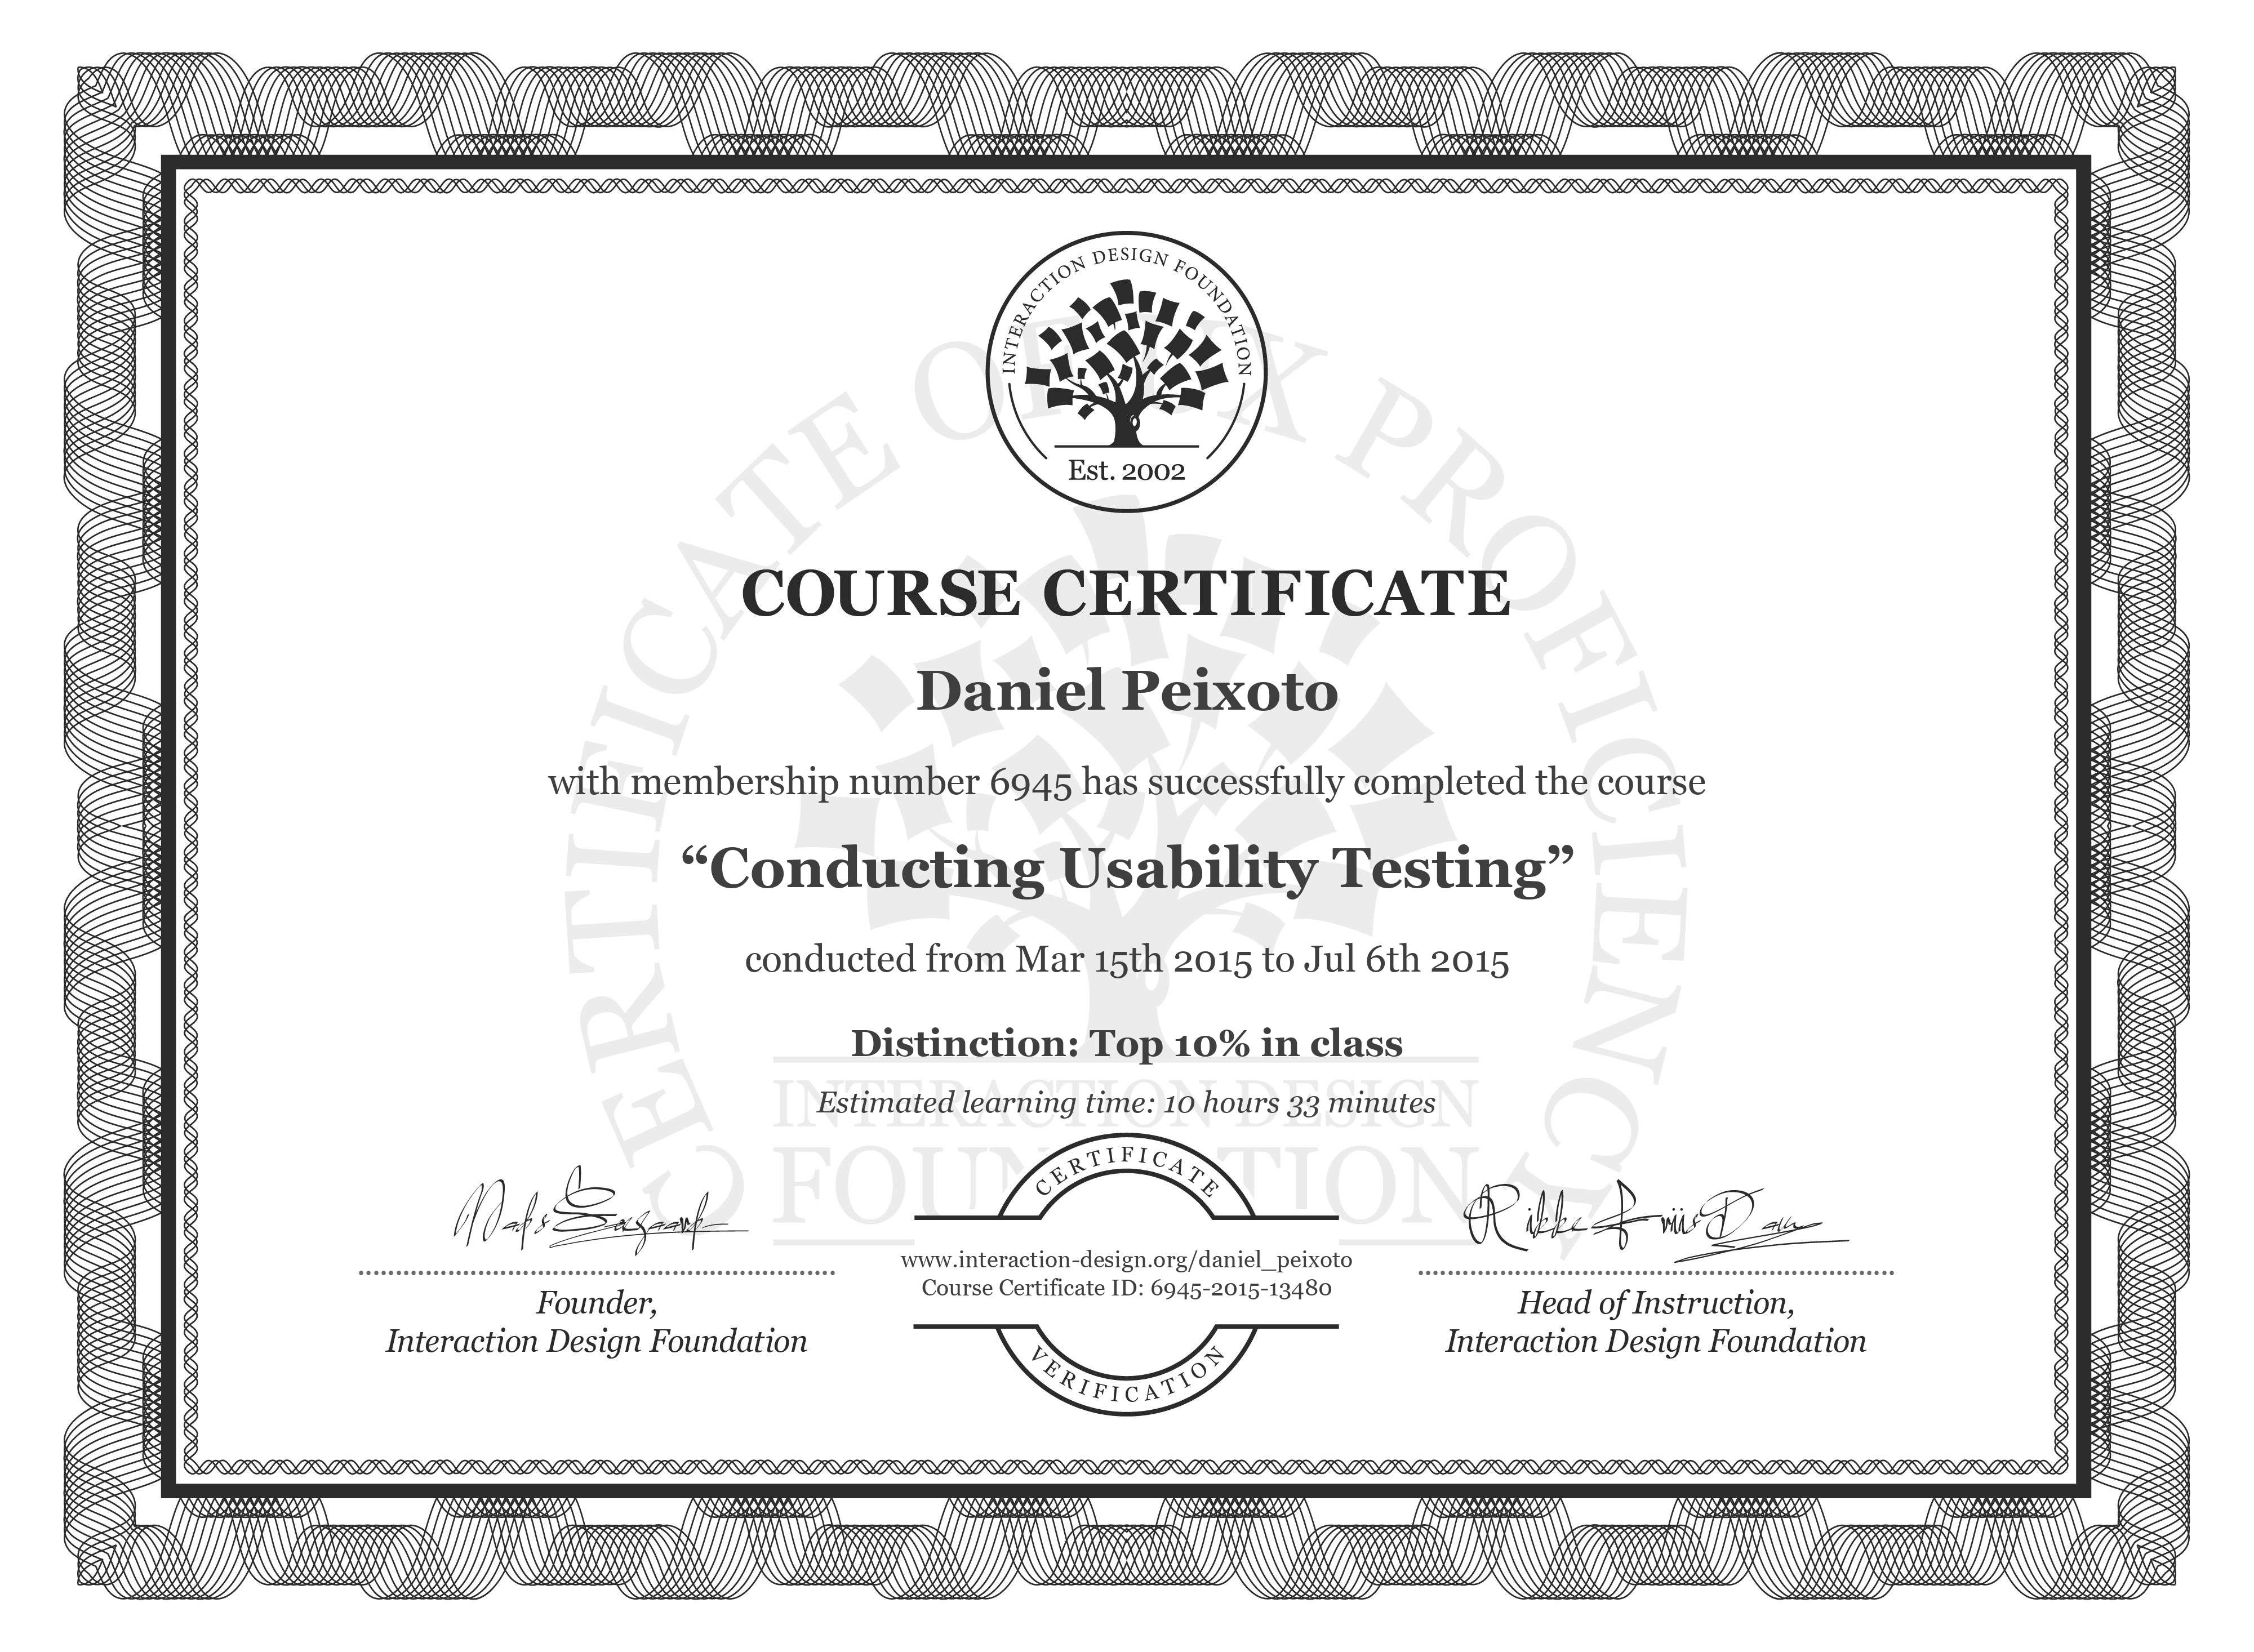 Daniel Peixoto: Course Certificate - Conducting Usability Testing